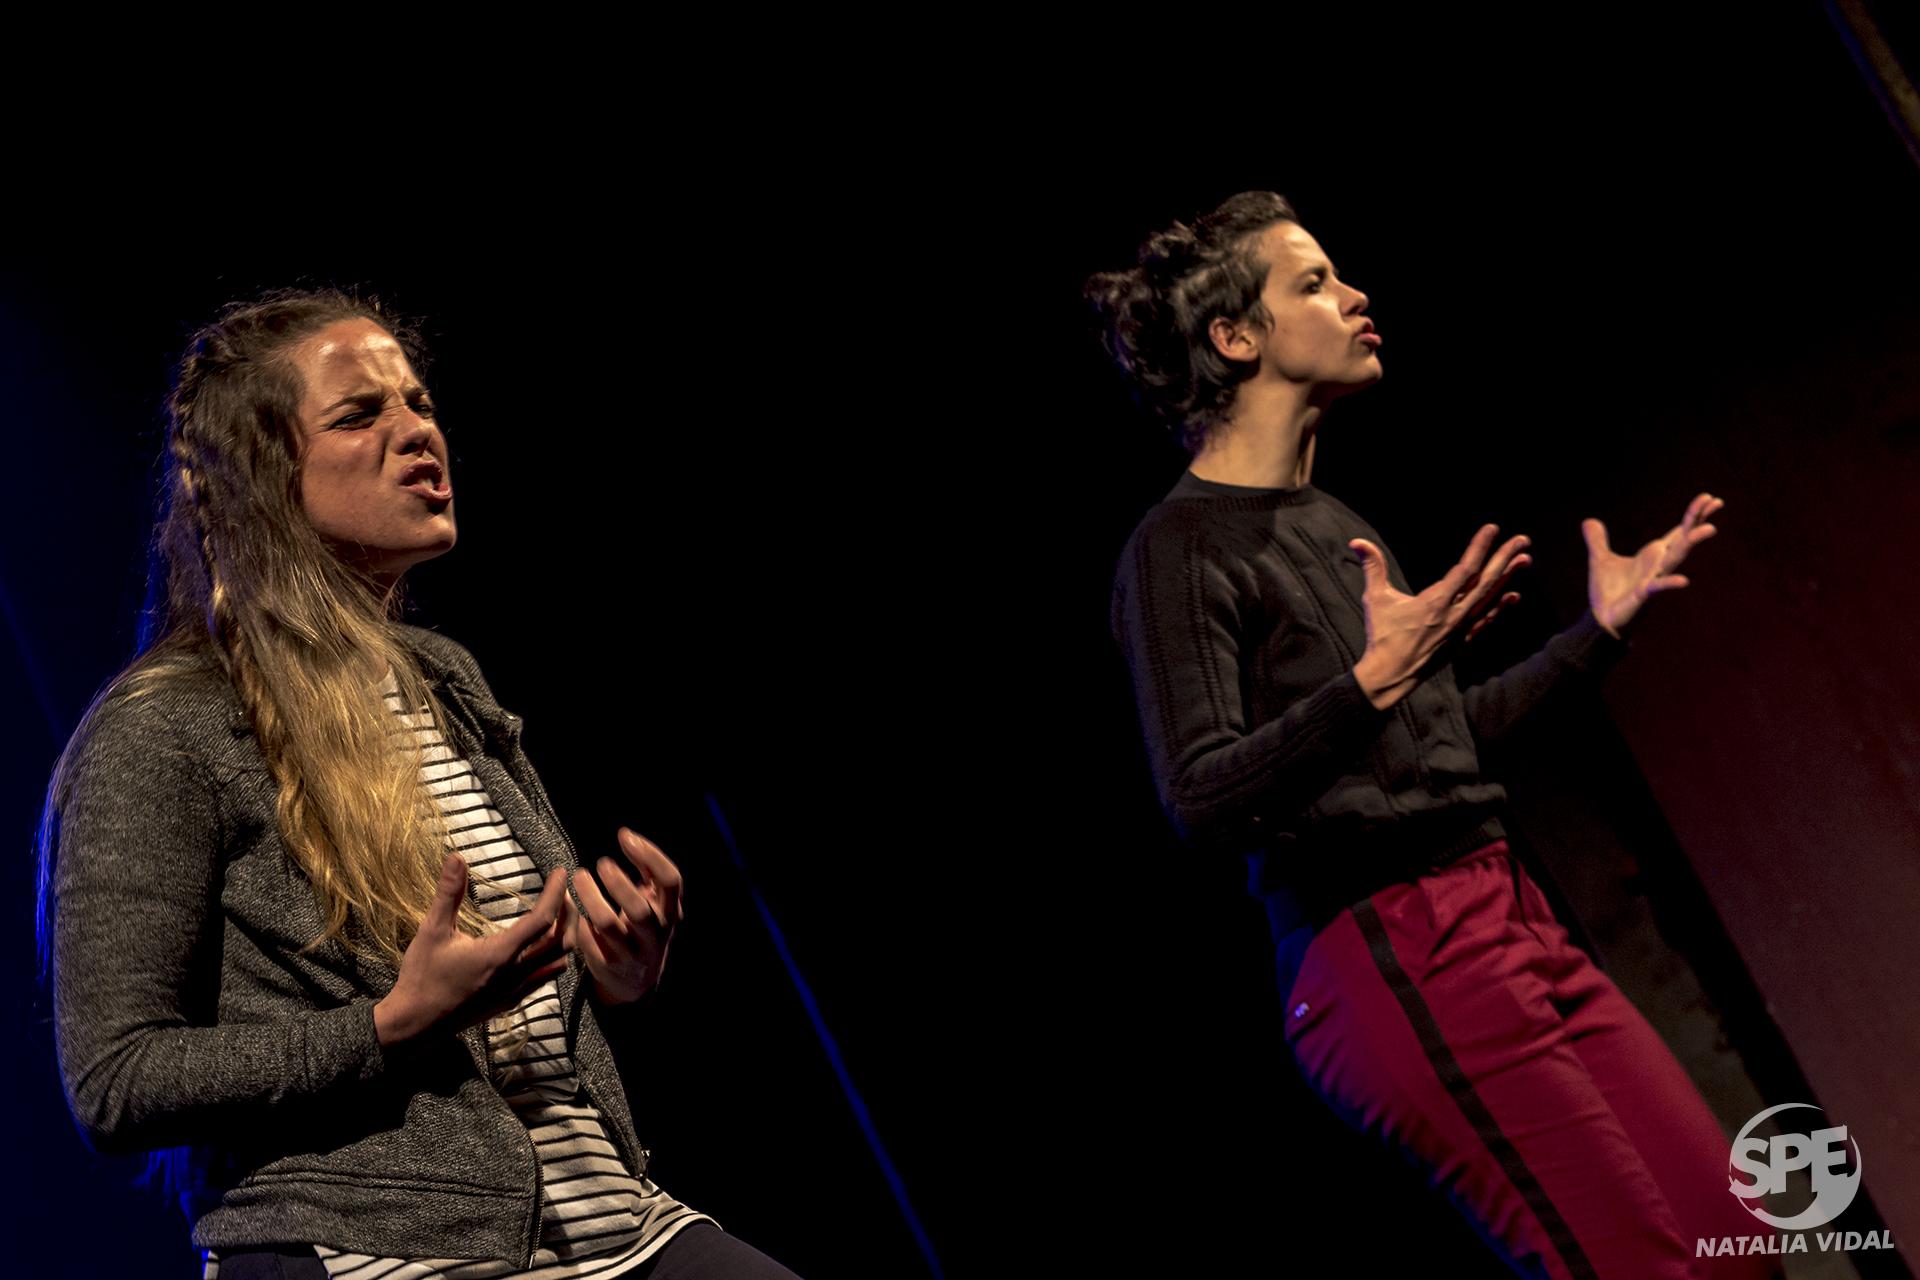 Perota-Chingo-Festi-Mercurio-Teatro-Xirgu-30-06-18-Natalia-Vidal-Solo-Para-Entendidos_408.jpg